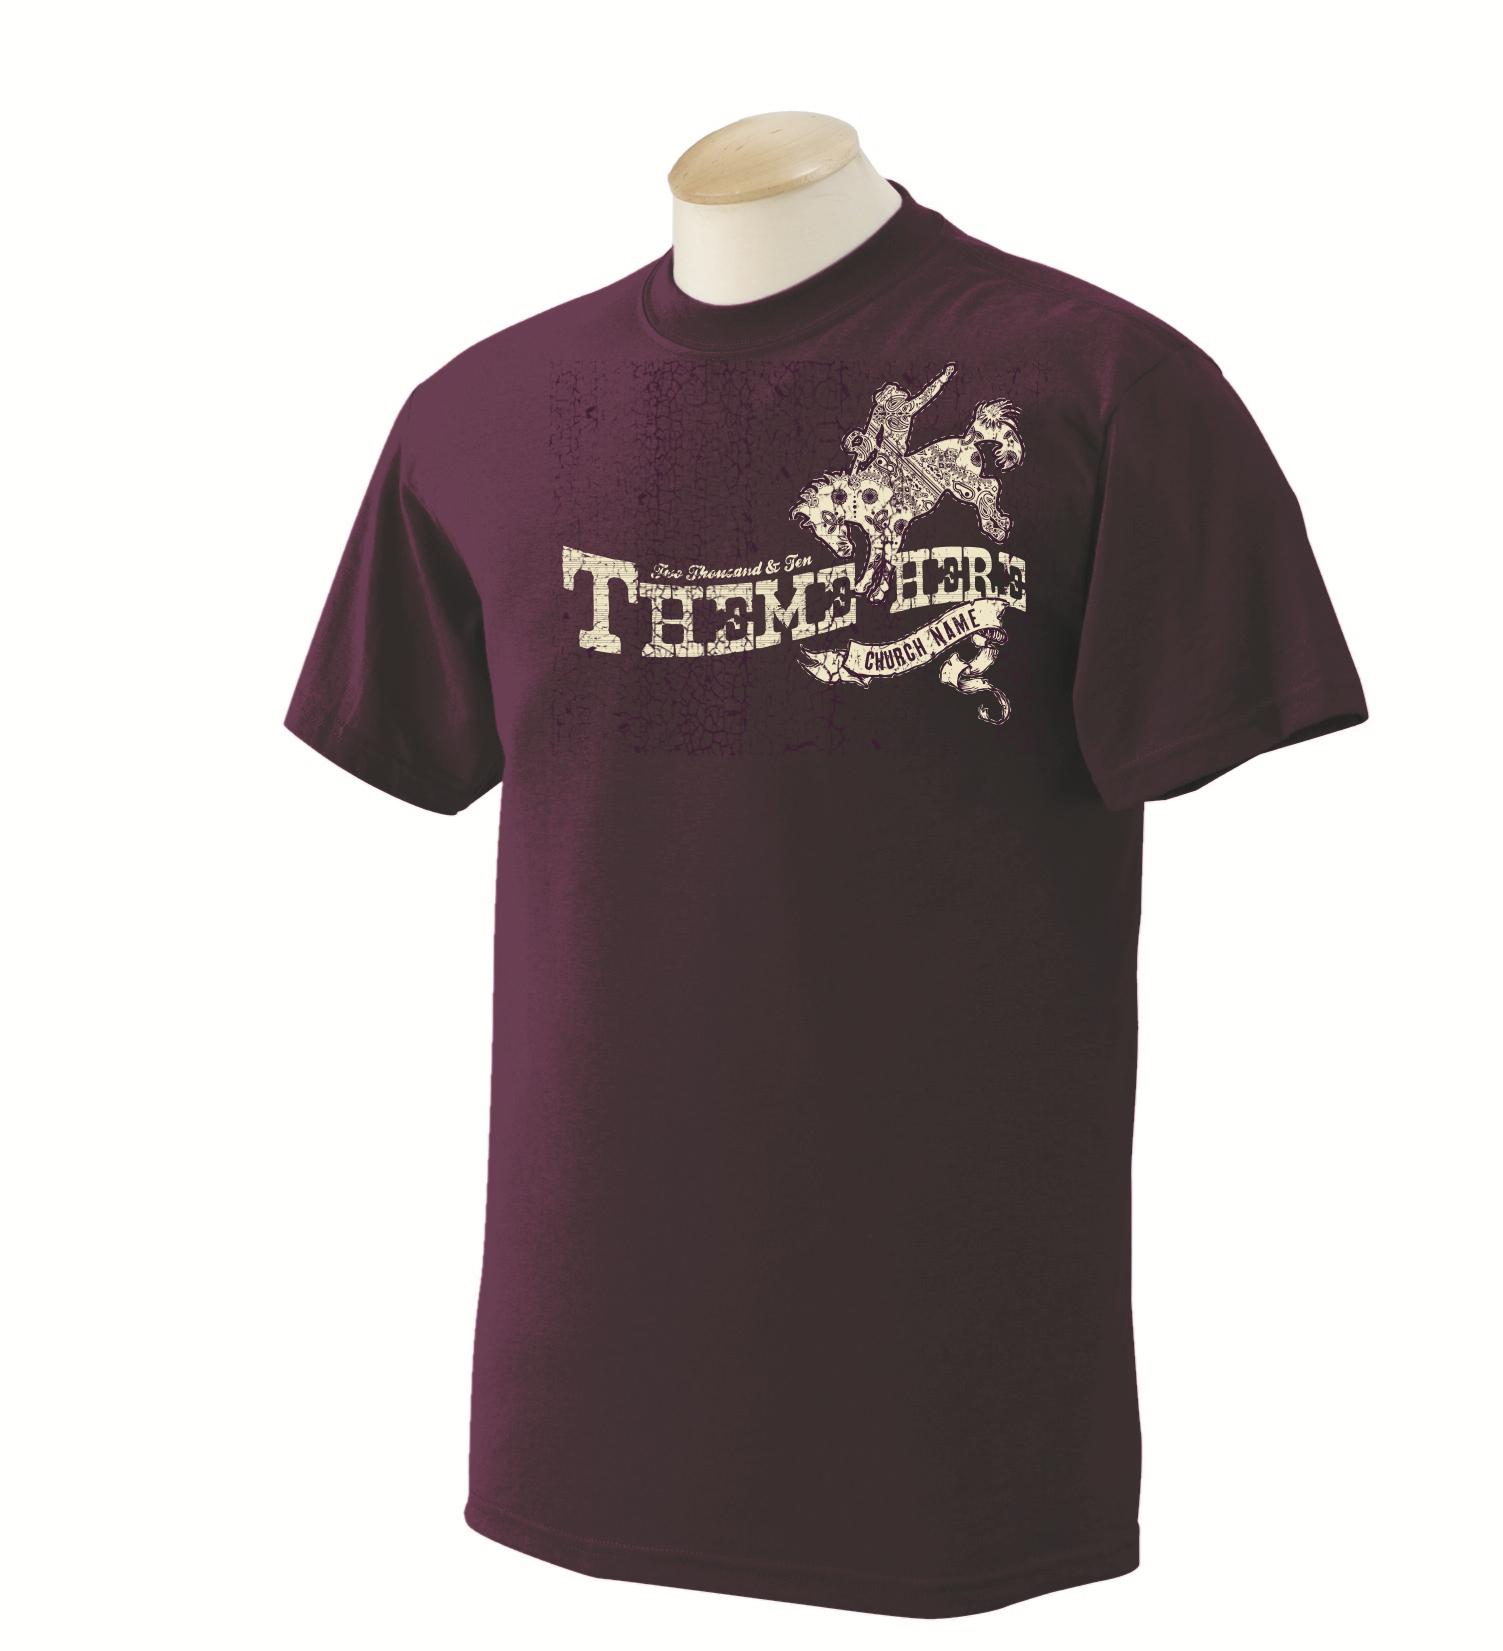 ranch 1 maroon shirt.jpg